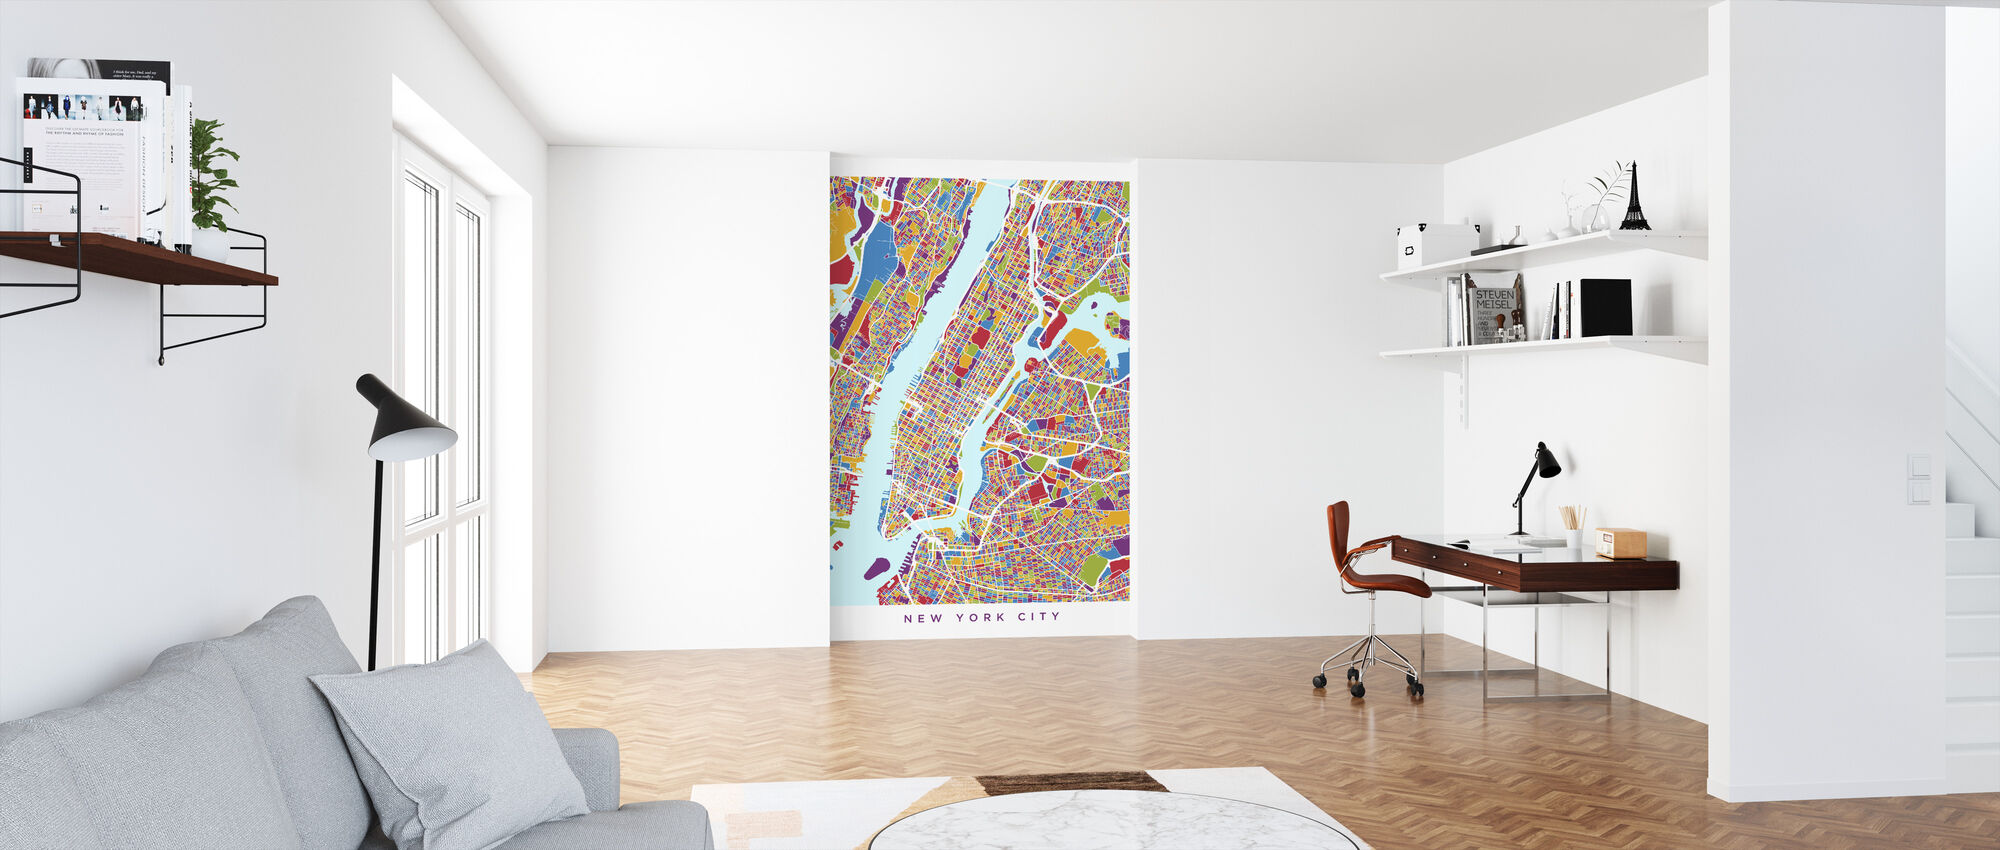 New York City Street Kaart - Behang - Kantoor